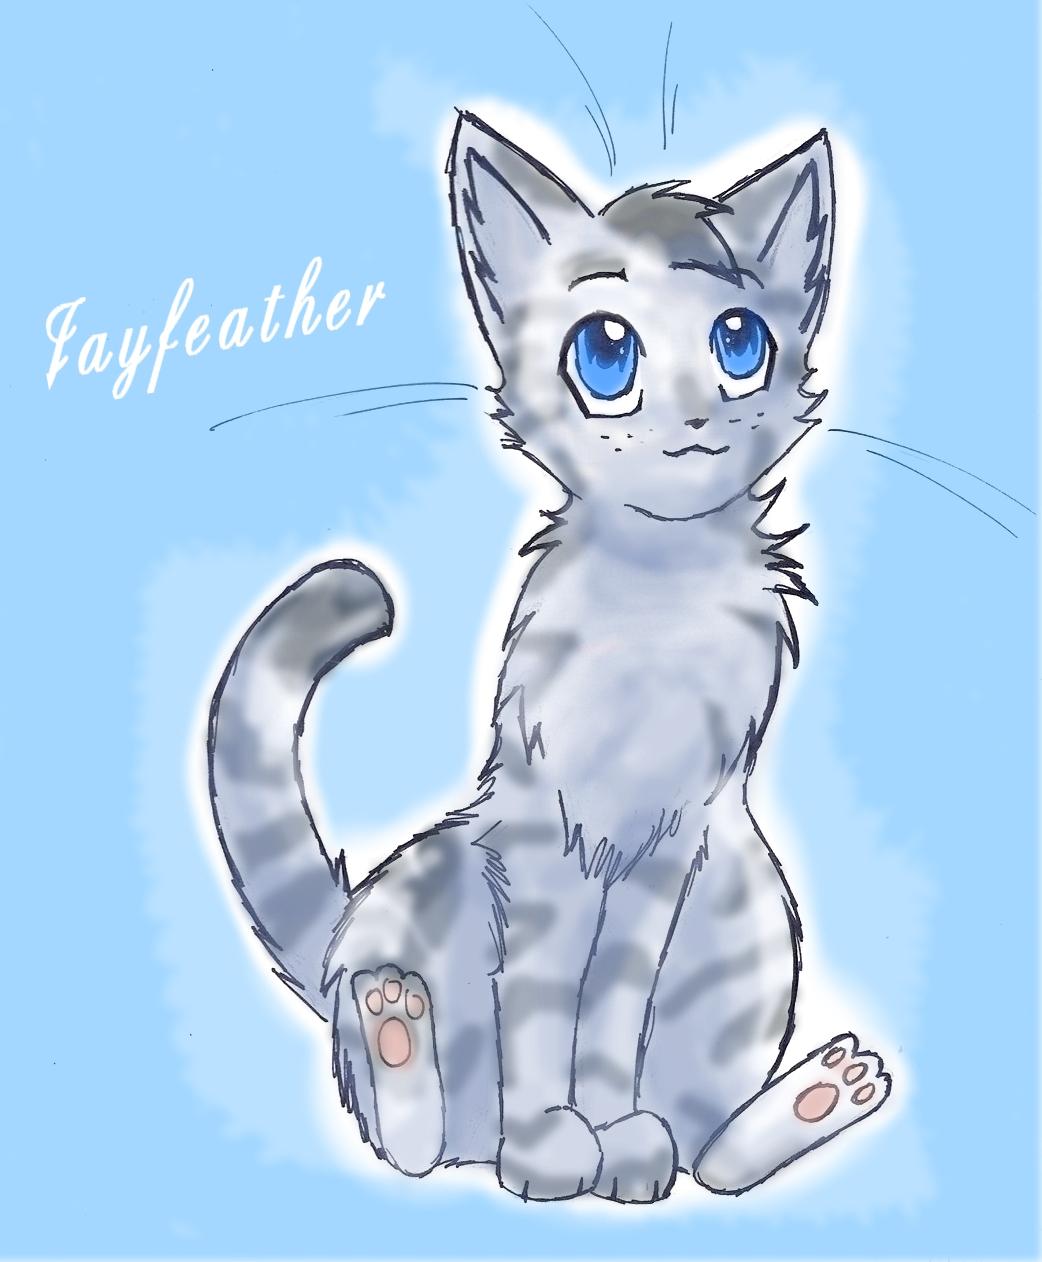 Good Wallpaper Minecraft Cats - Jayfeather-3-warrior-cats-29838853-1042-1262  Image_43727.jpg